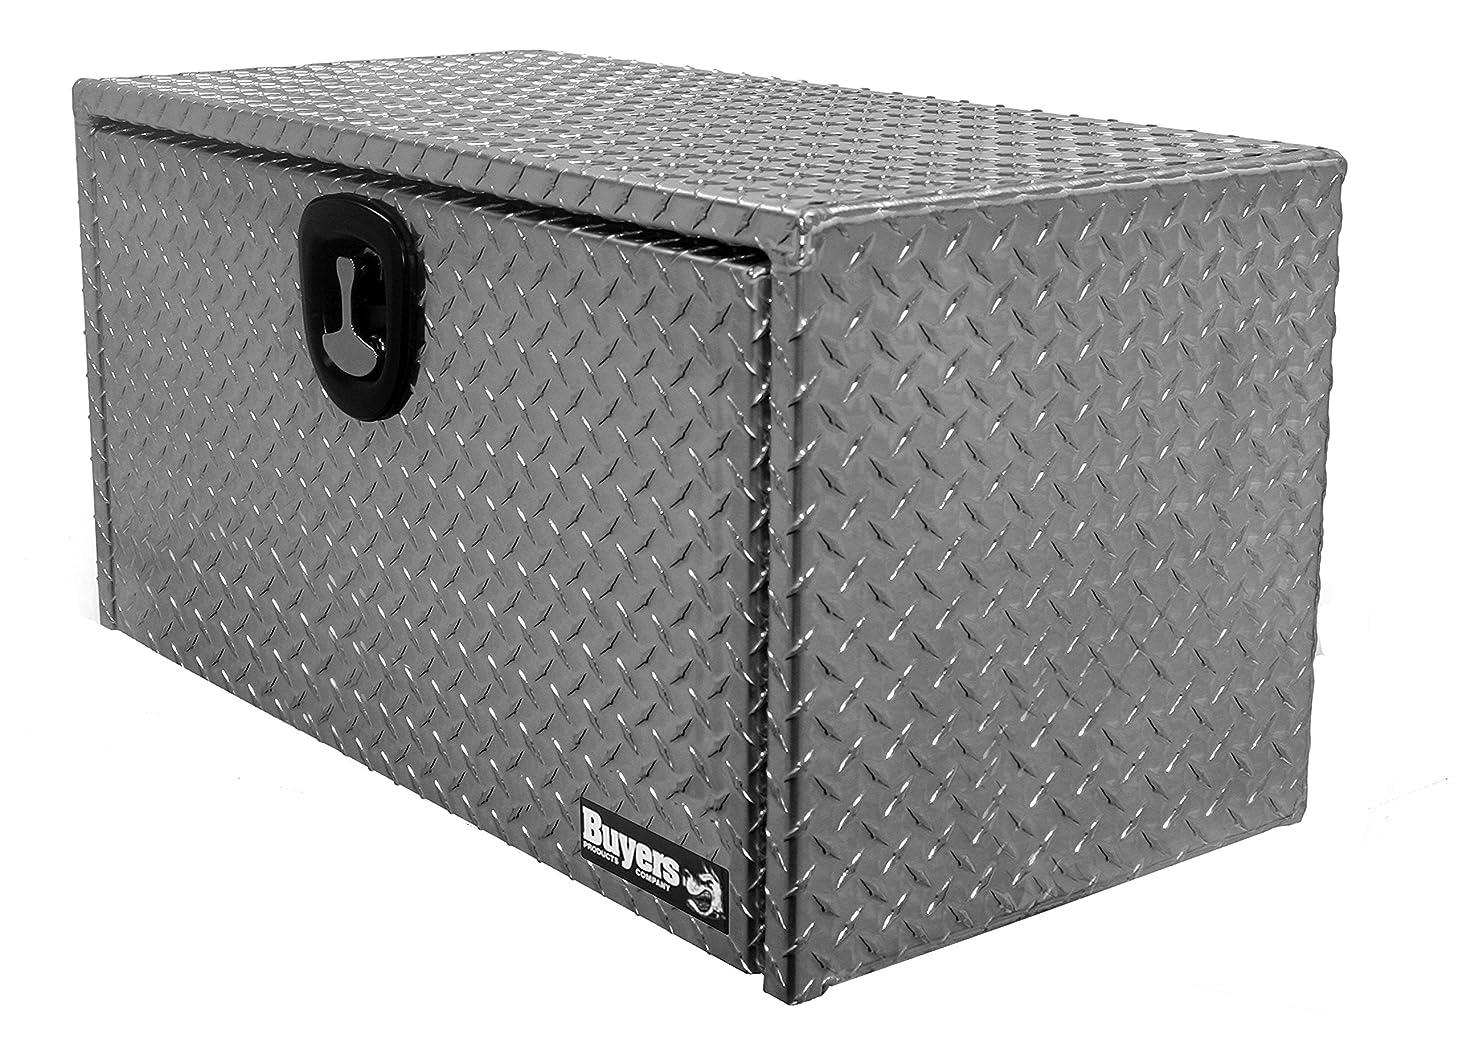 Buyers Products Diamond Tread Aluminum Underbody Truck Box w/ 3-Point Latch (18x18x36 Inch)